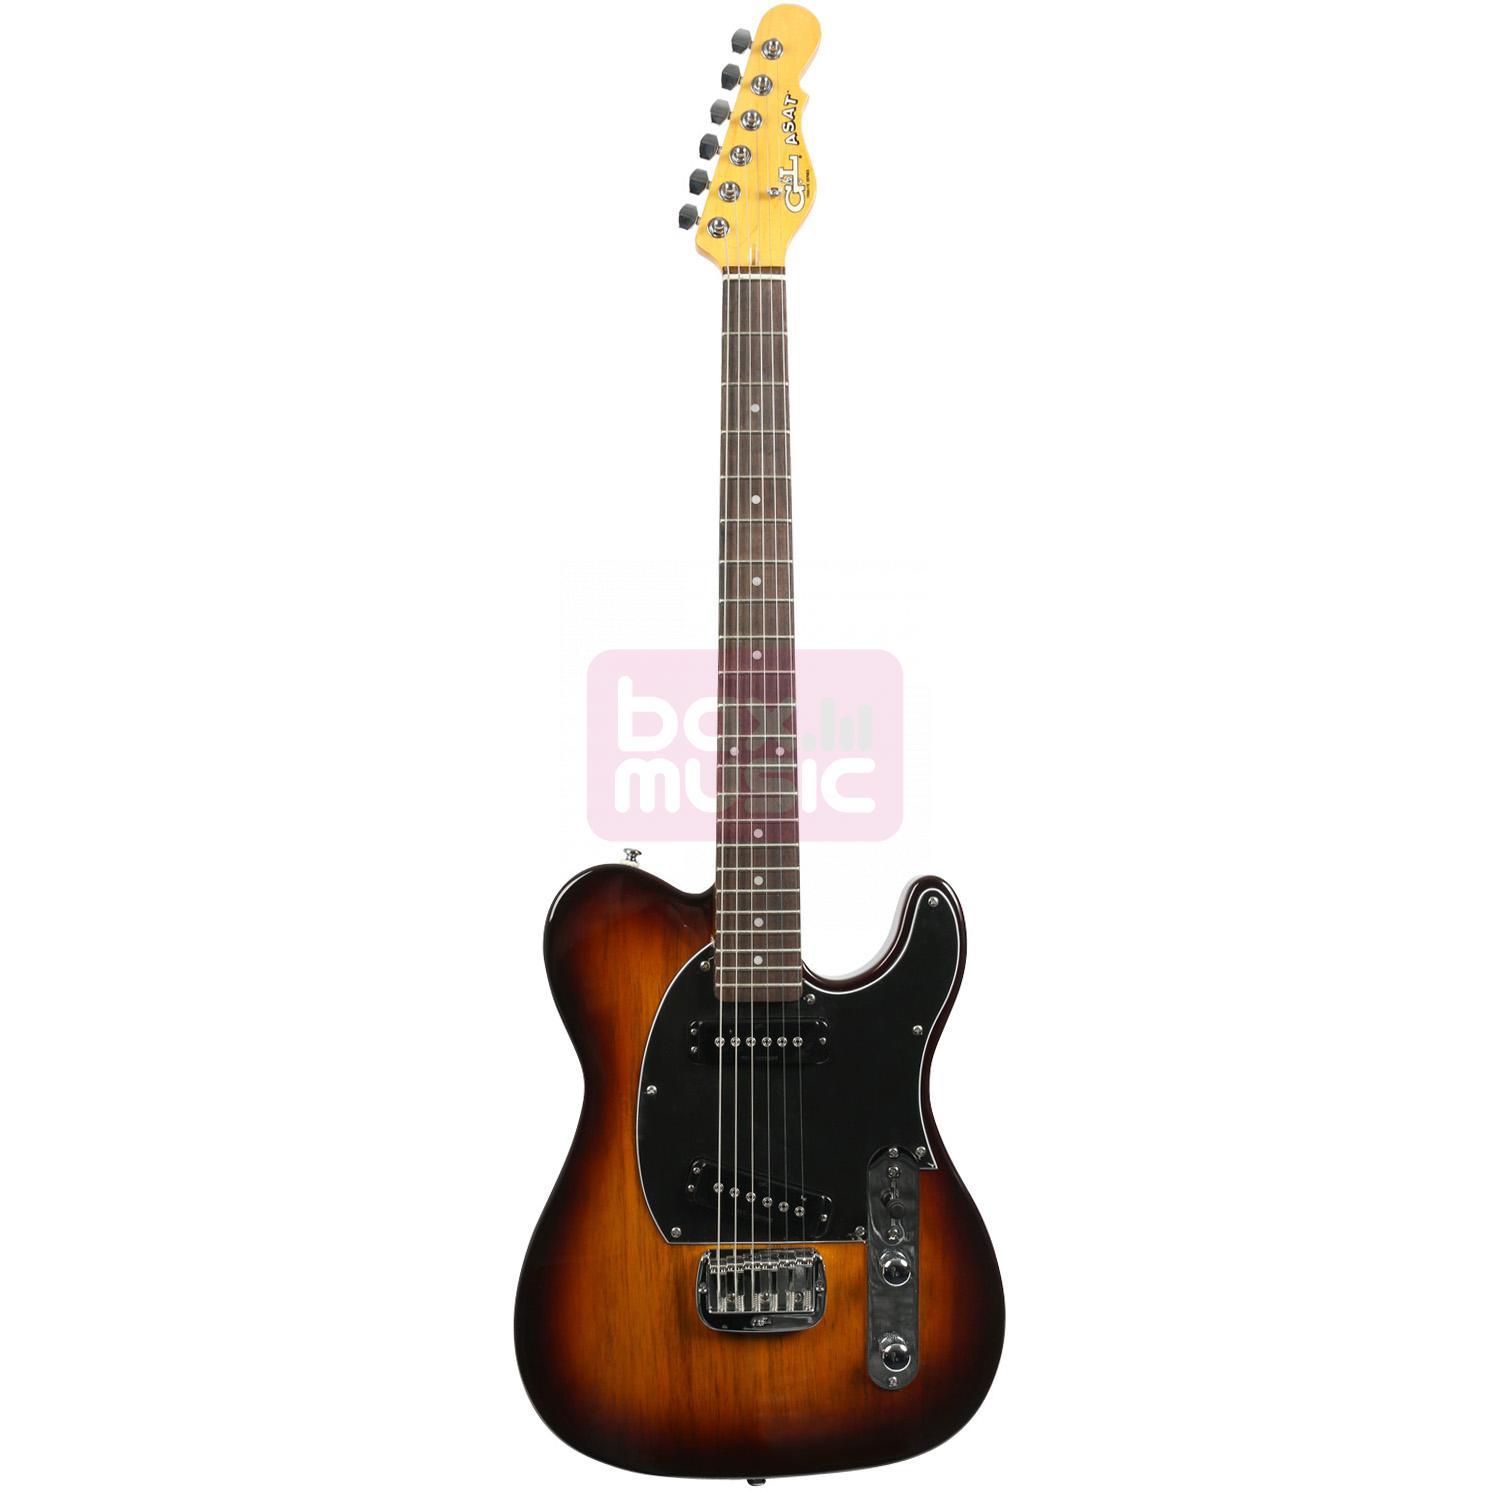 G&L Tribute ASAT Special elektrische gitaar Tobacco Sunburst